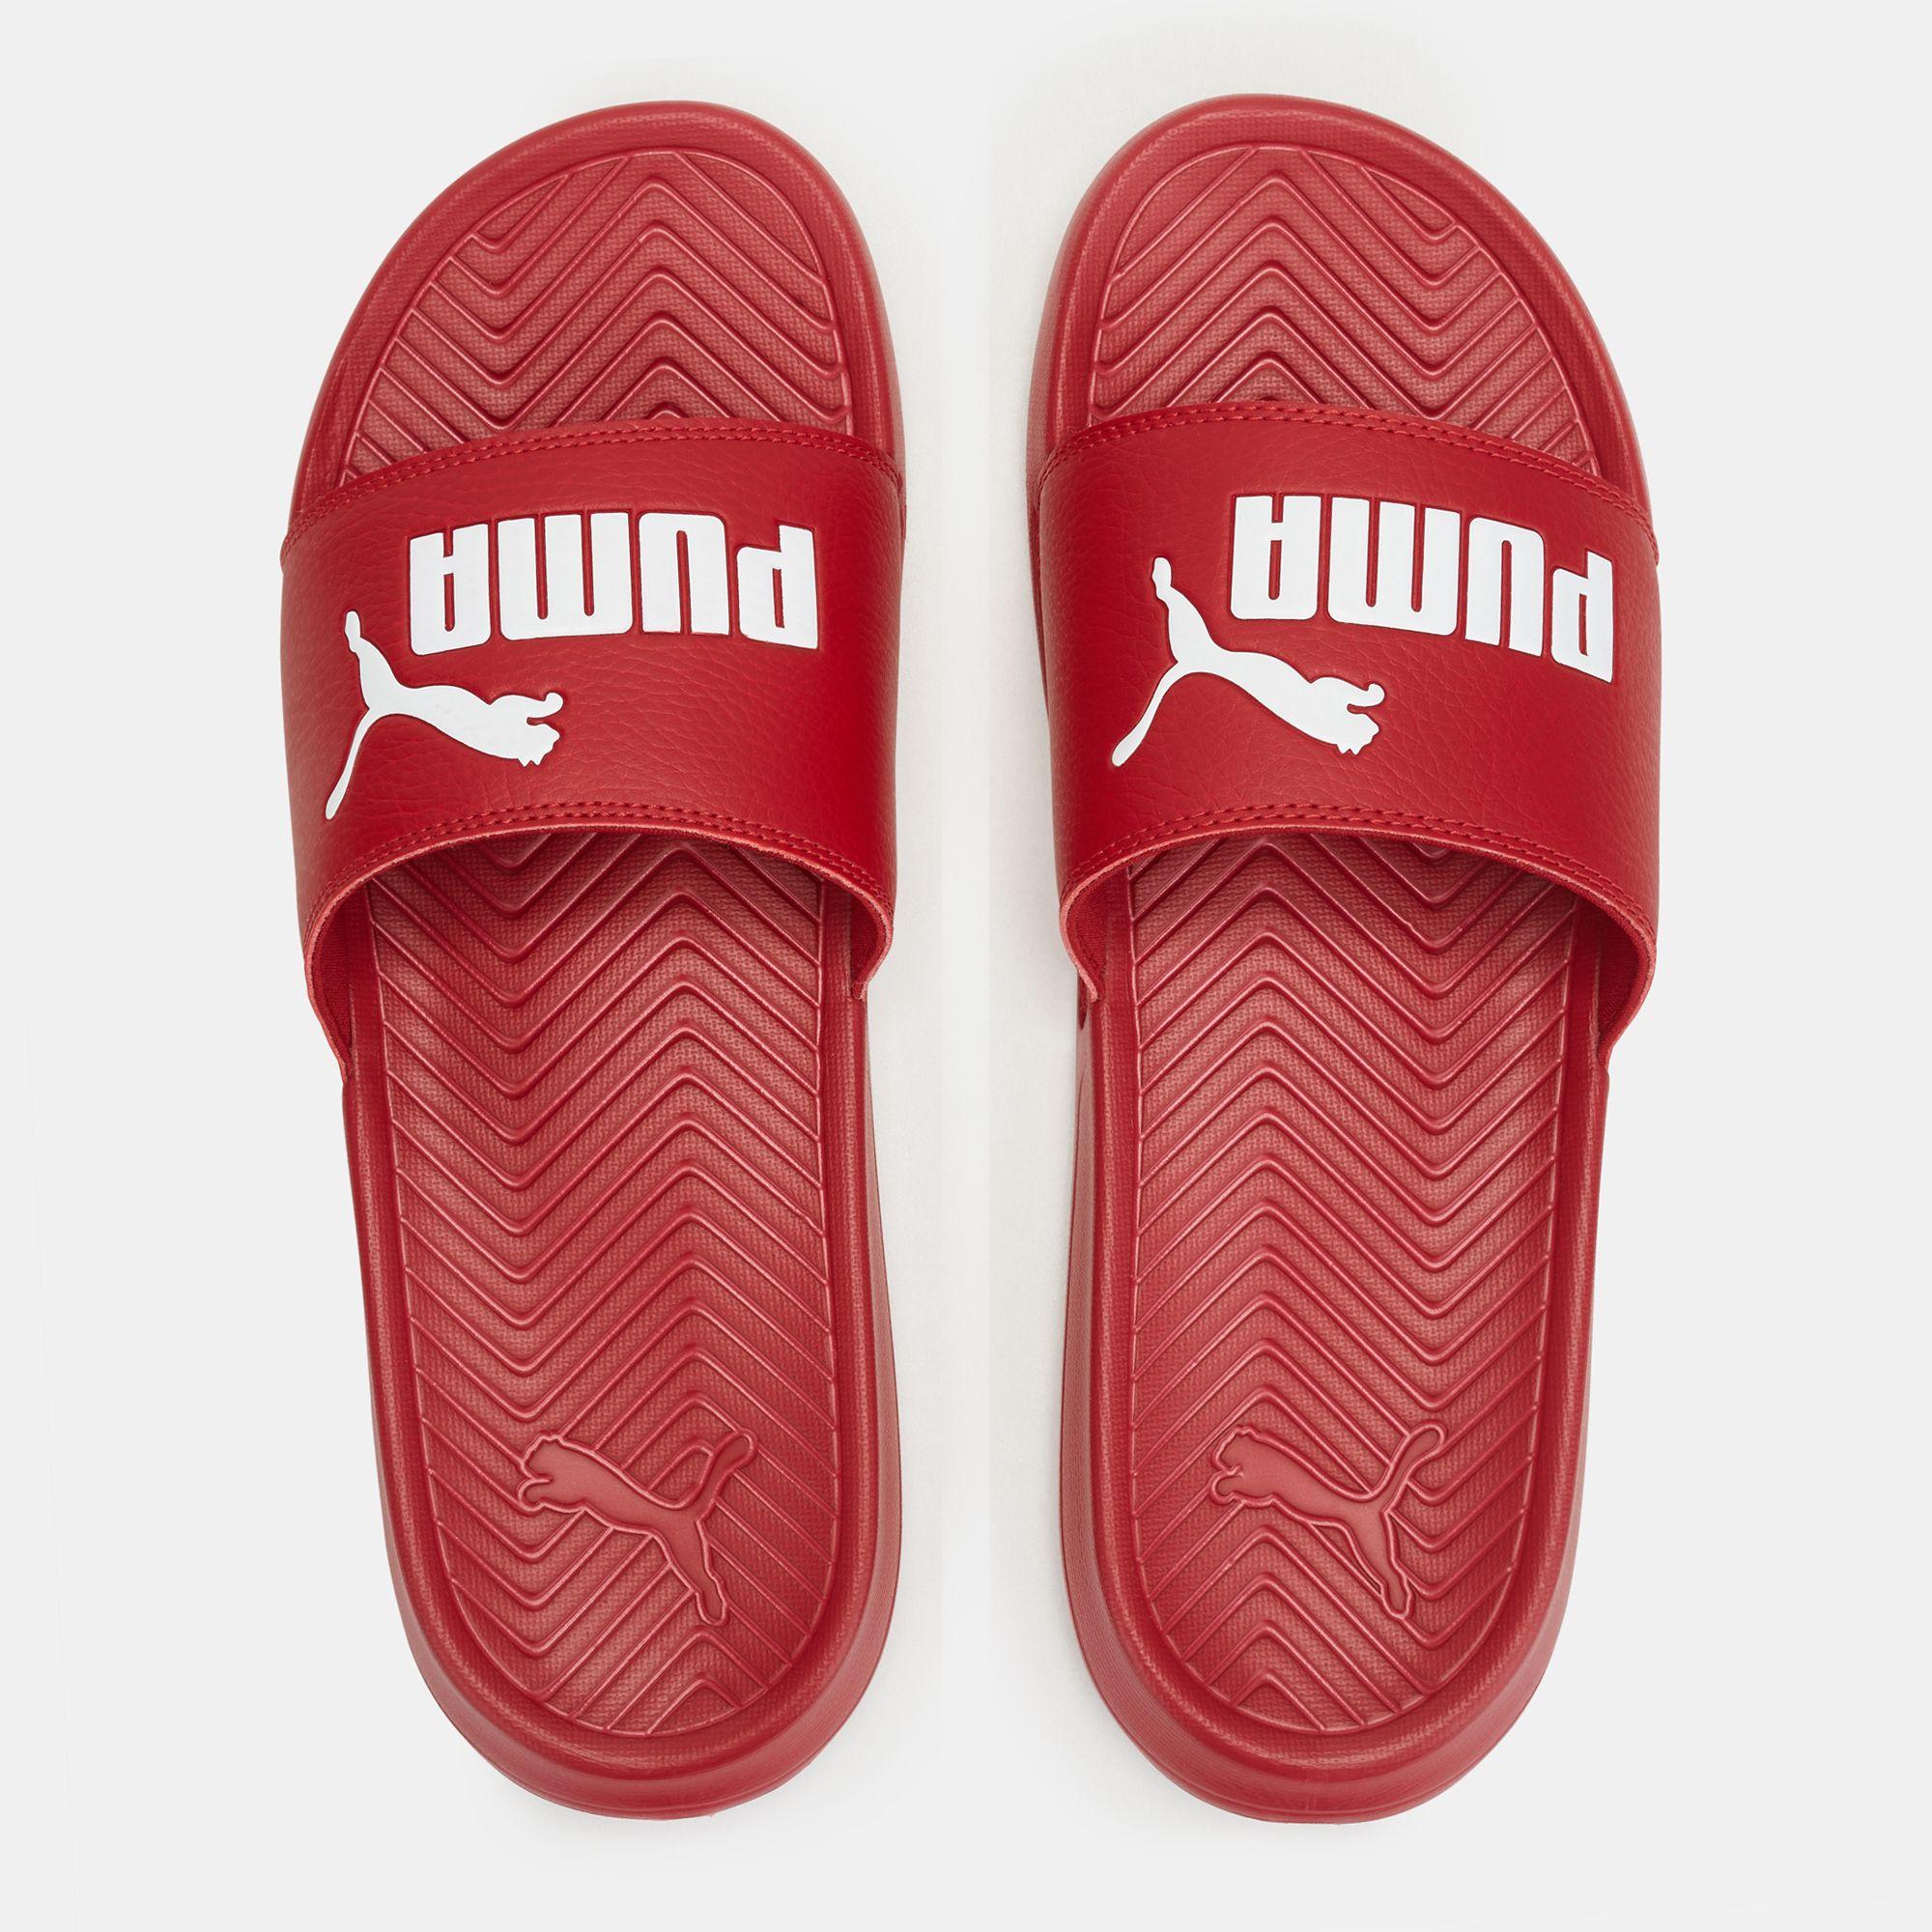 8880436a47ef7a PUMA Popcat Slide Sandals